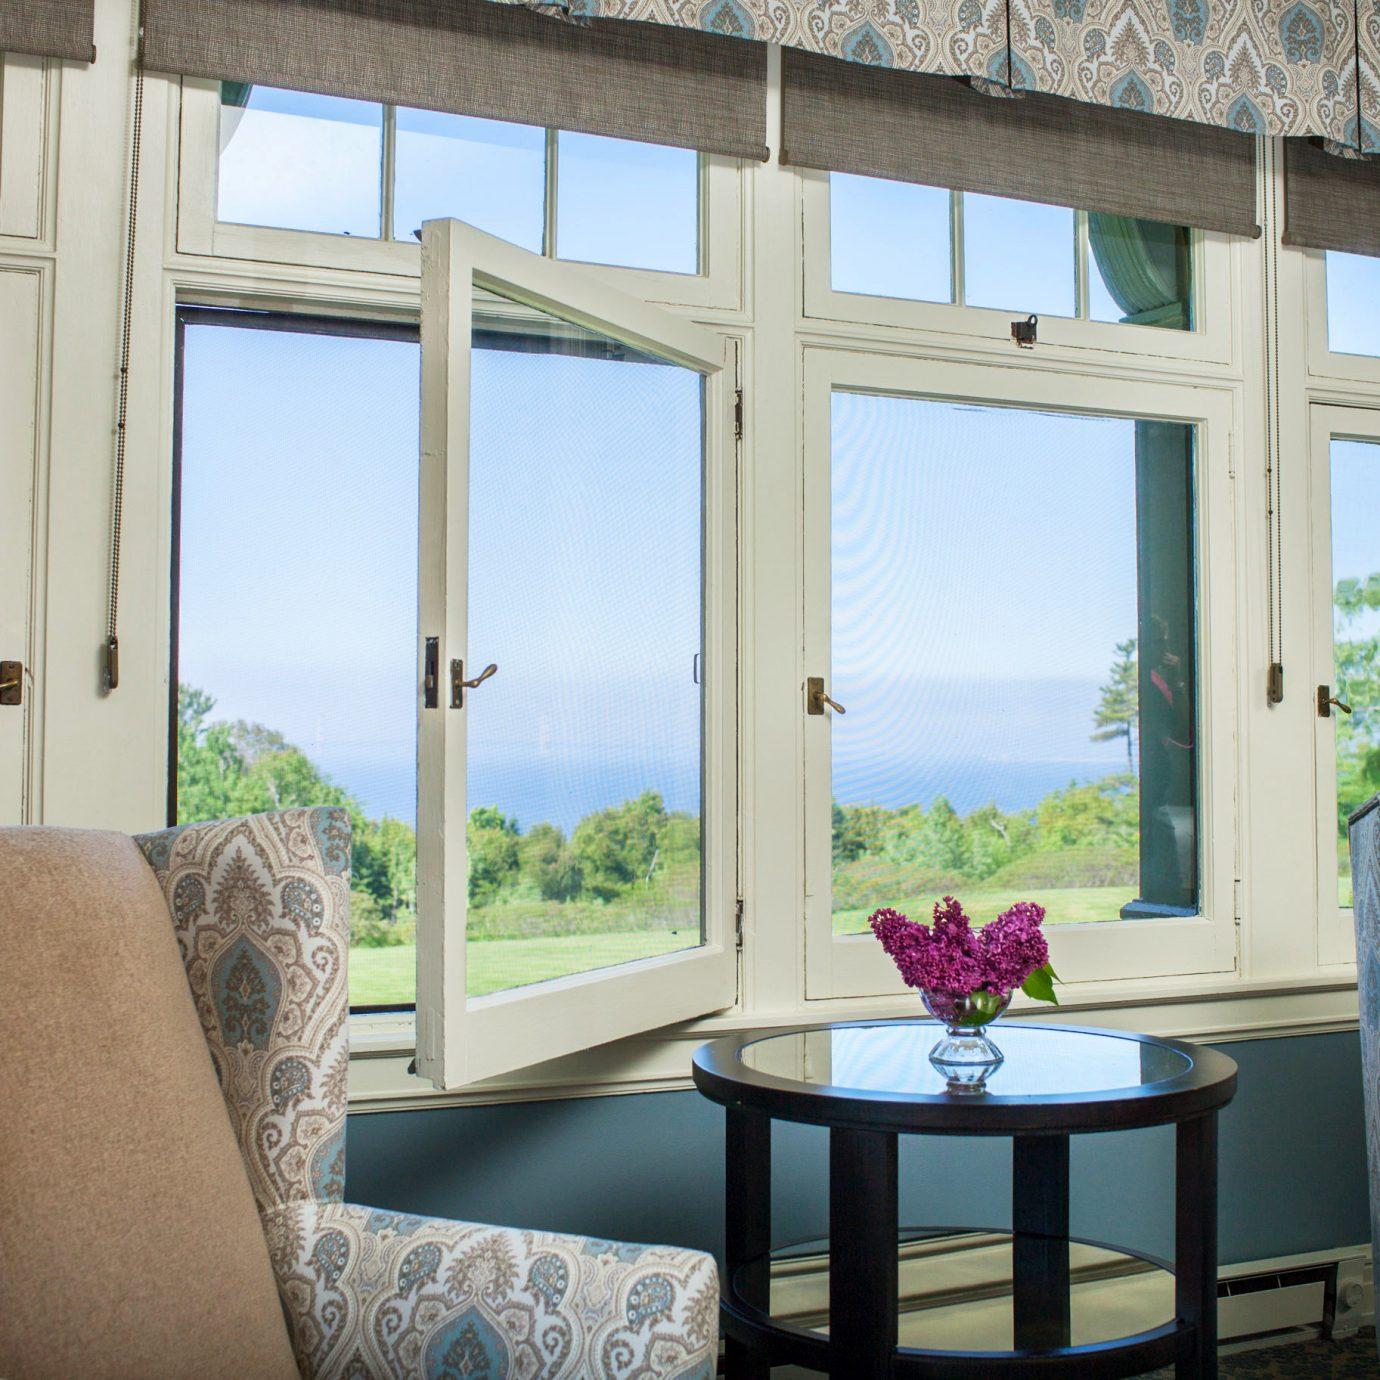 Lounge Scenic views sofa property living room home house porch cottage condominium window treatment curtain Villa seat